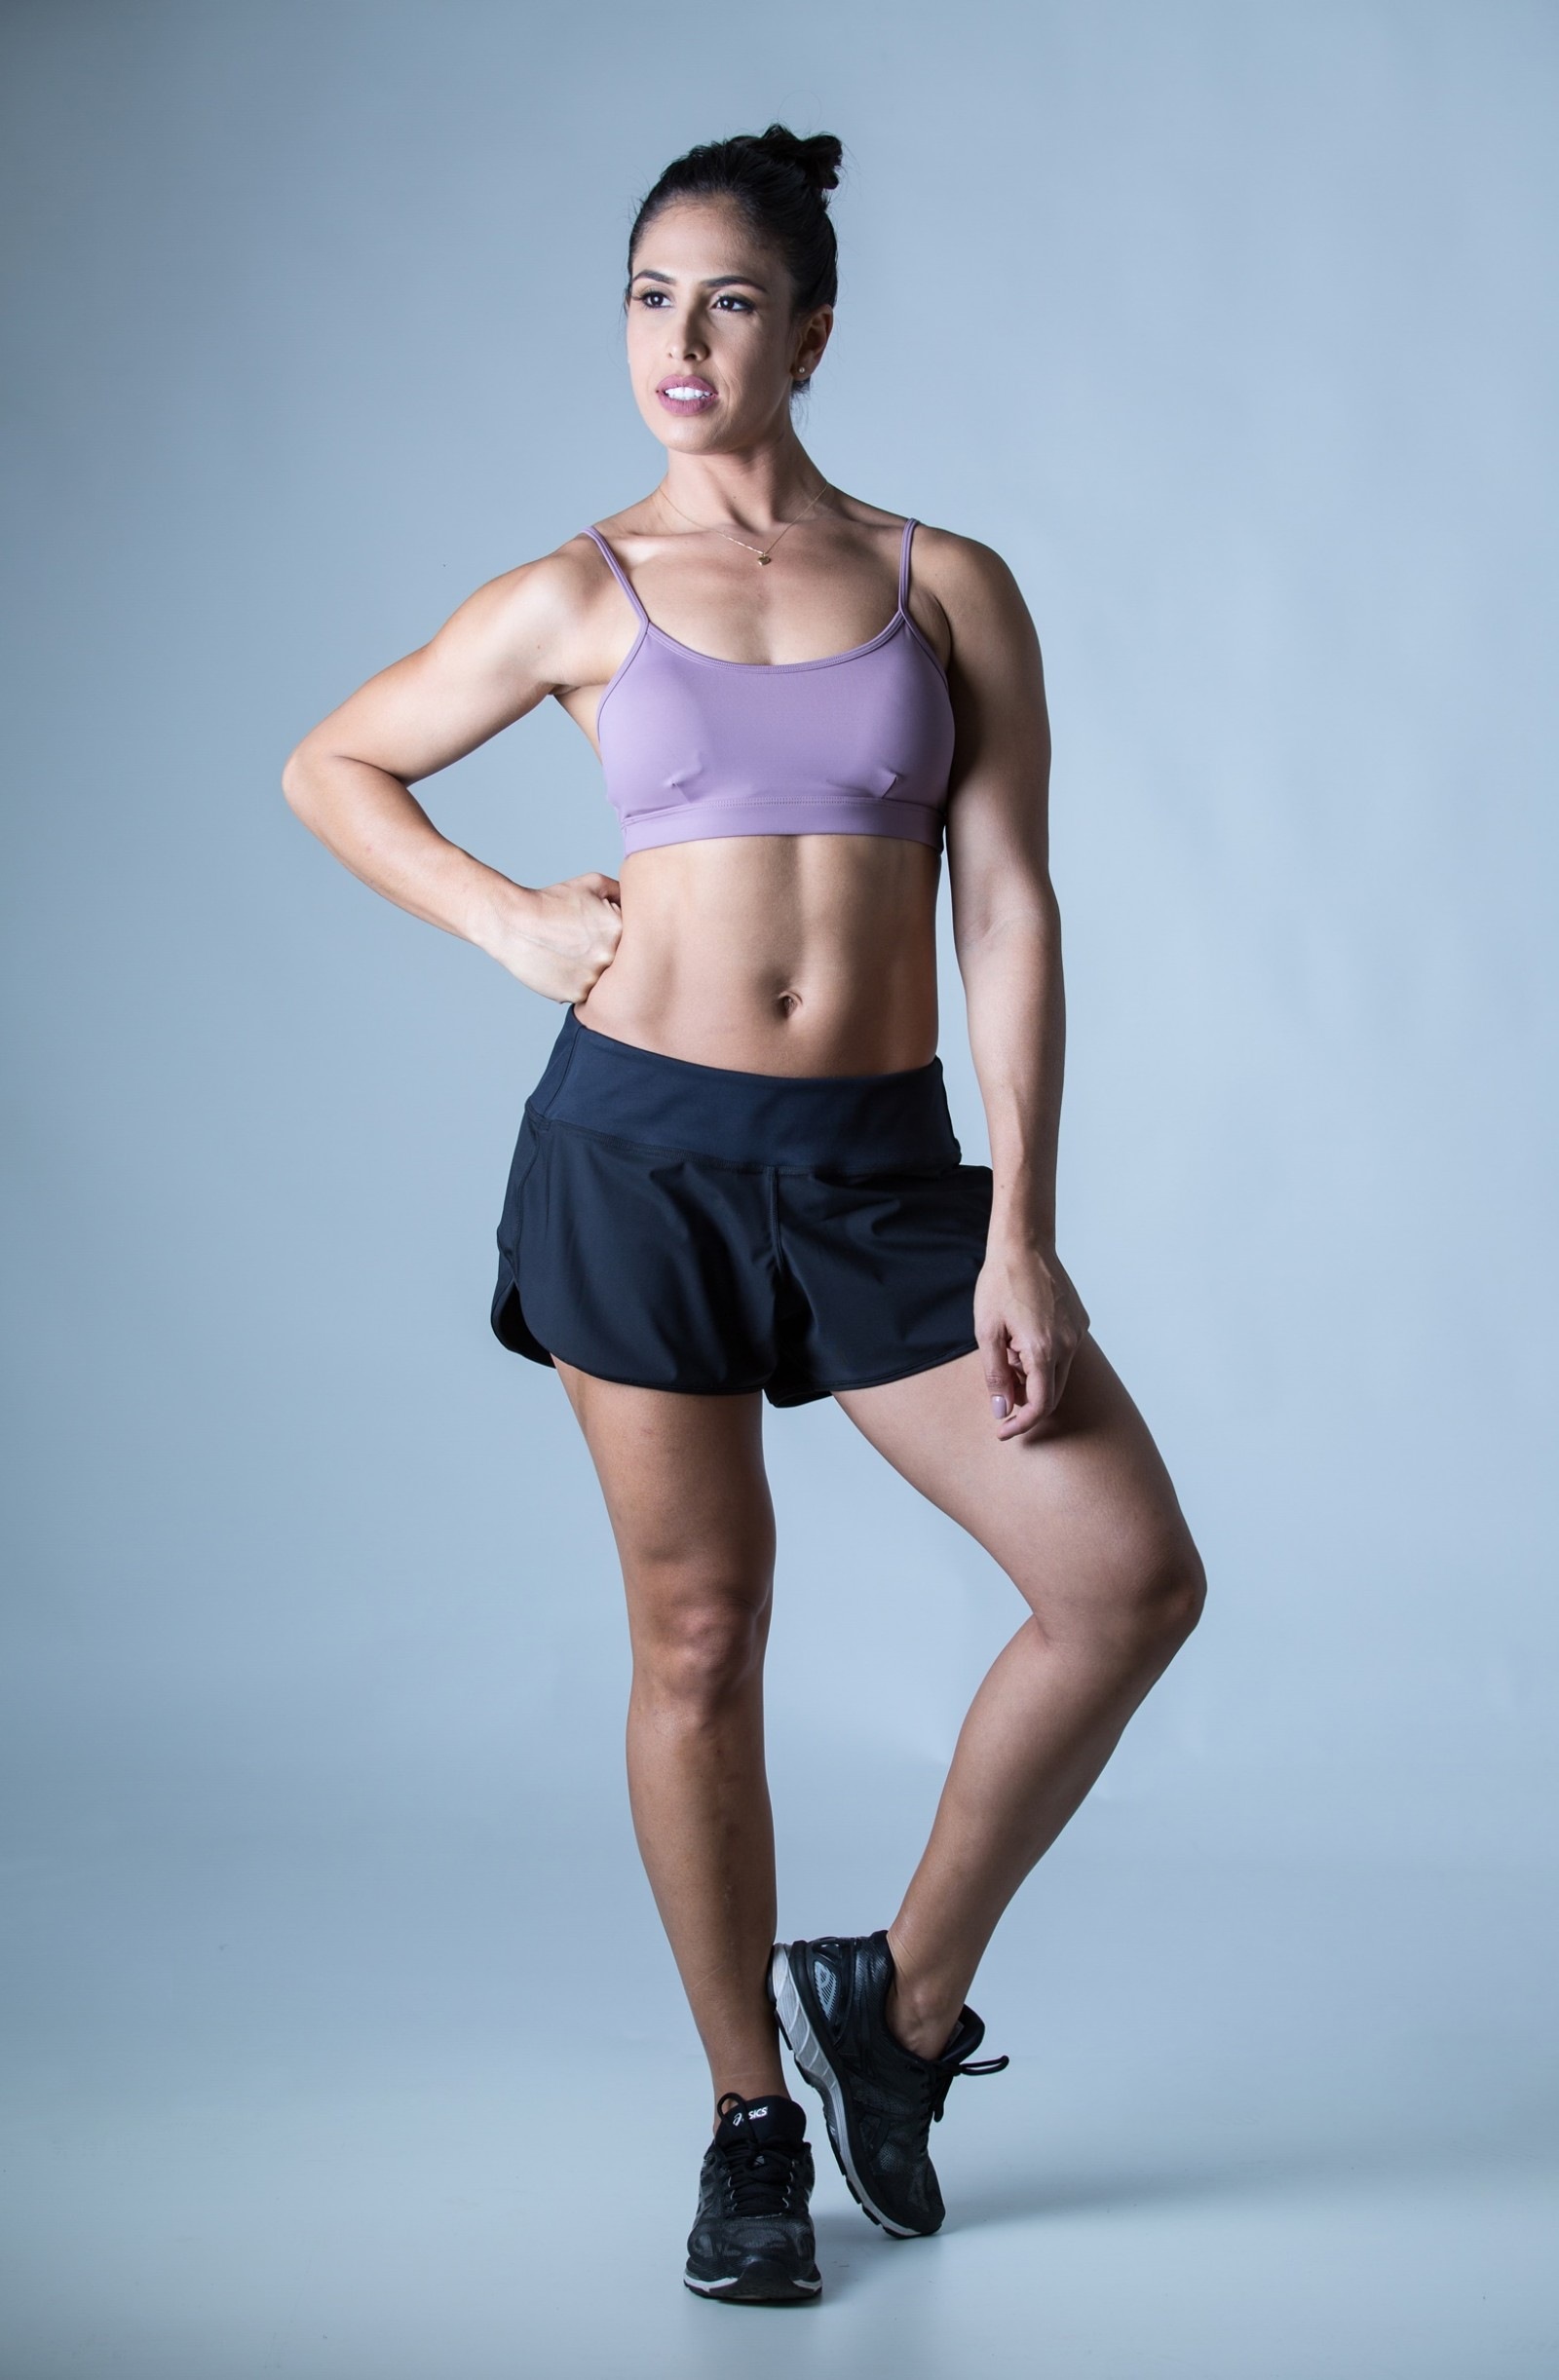 Top Profusion Flan de Uva, Coleção Plenitude - NKT Fitwear Moda Fitness